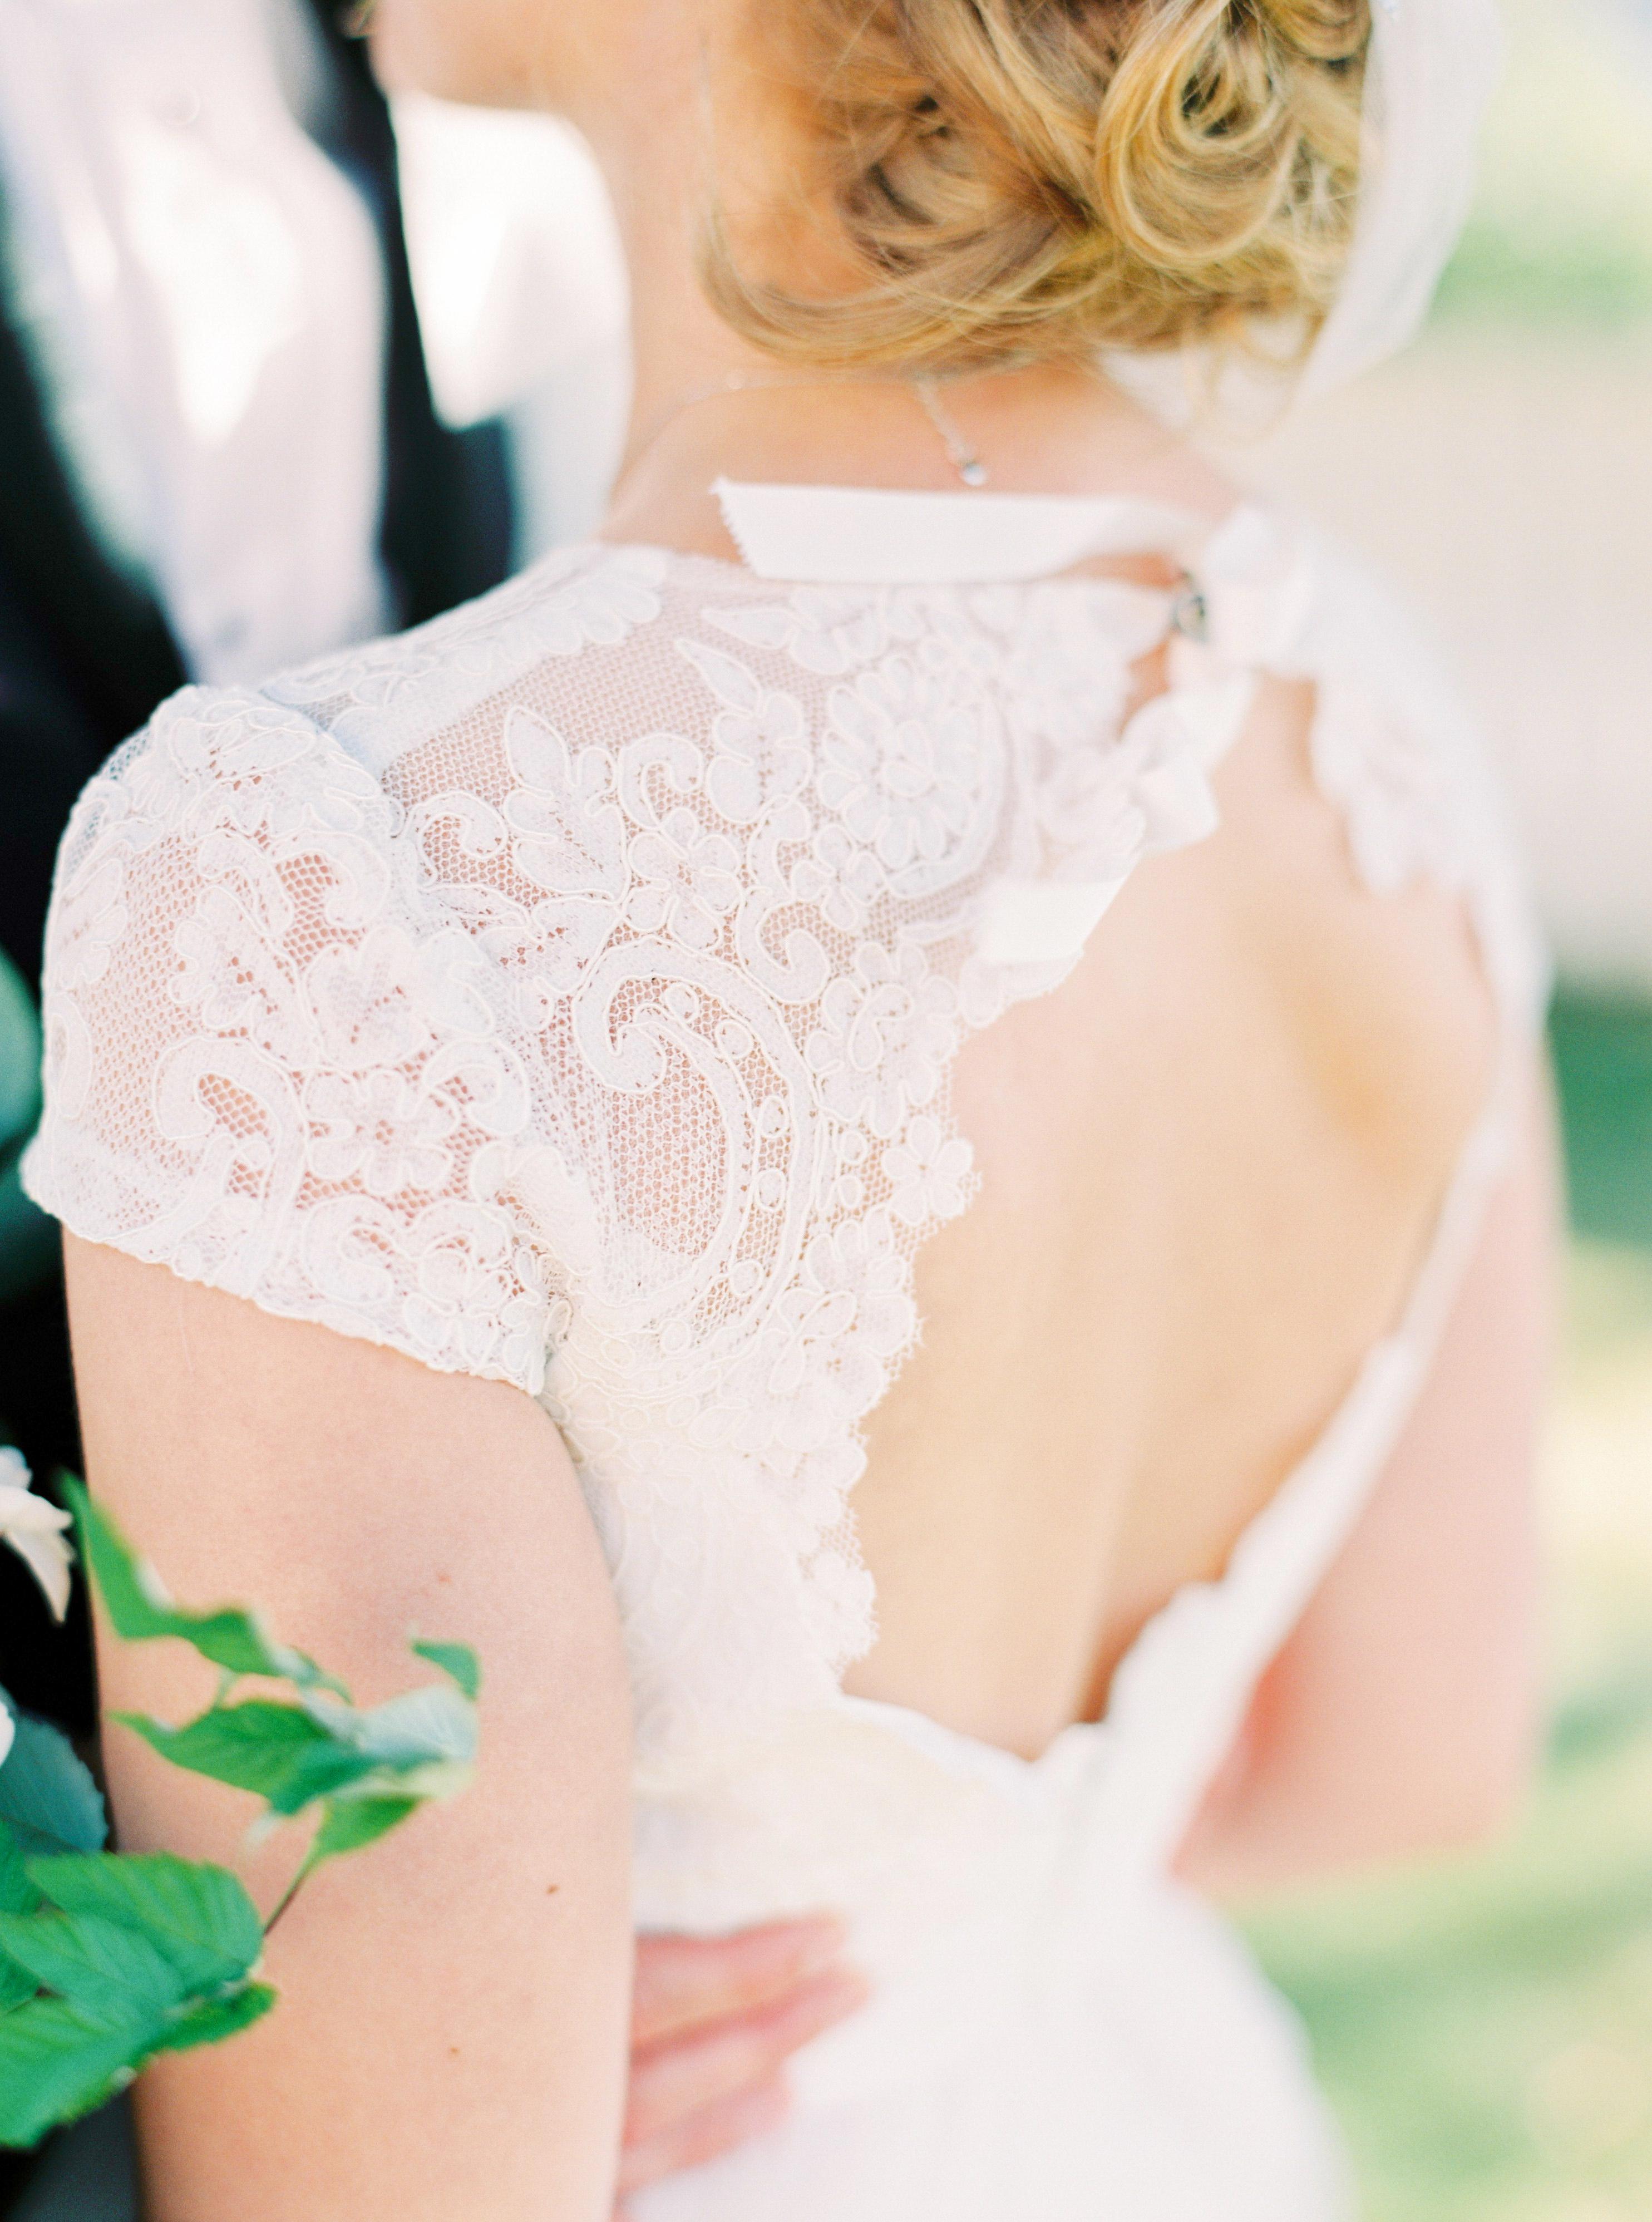 A Bride with an Open Back Wedding Dress